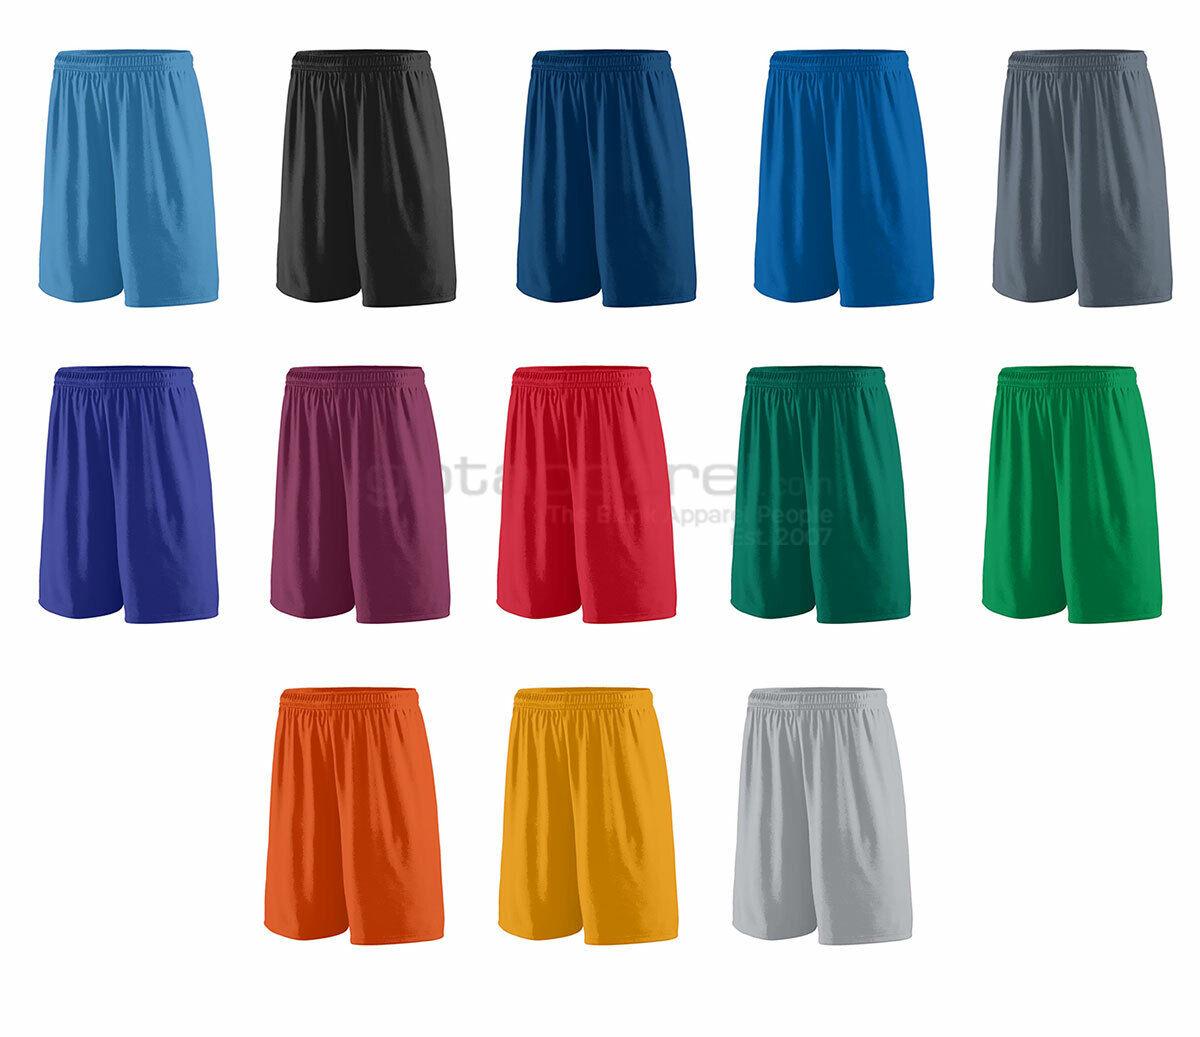 Augusta Sportswear Mens Elastic Waistband Wicking Knit Sport Shorts 1420